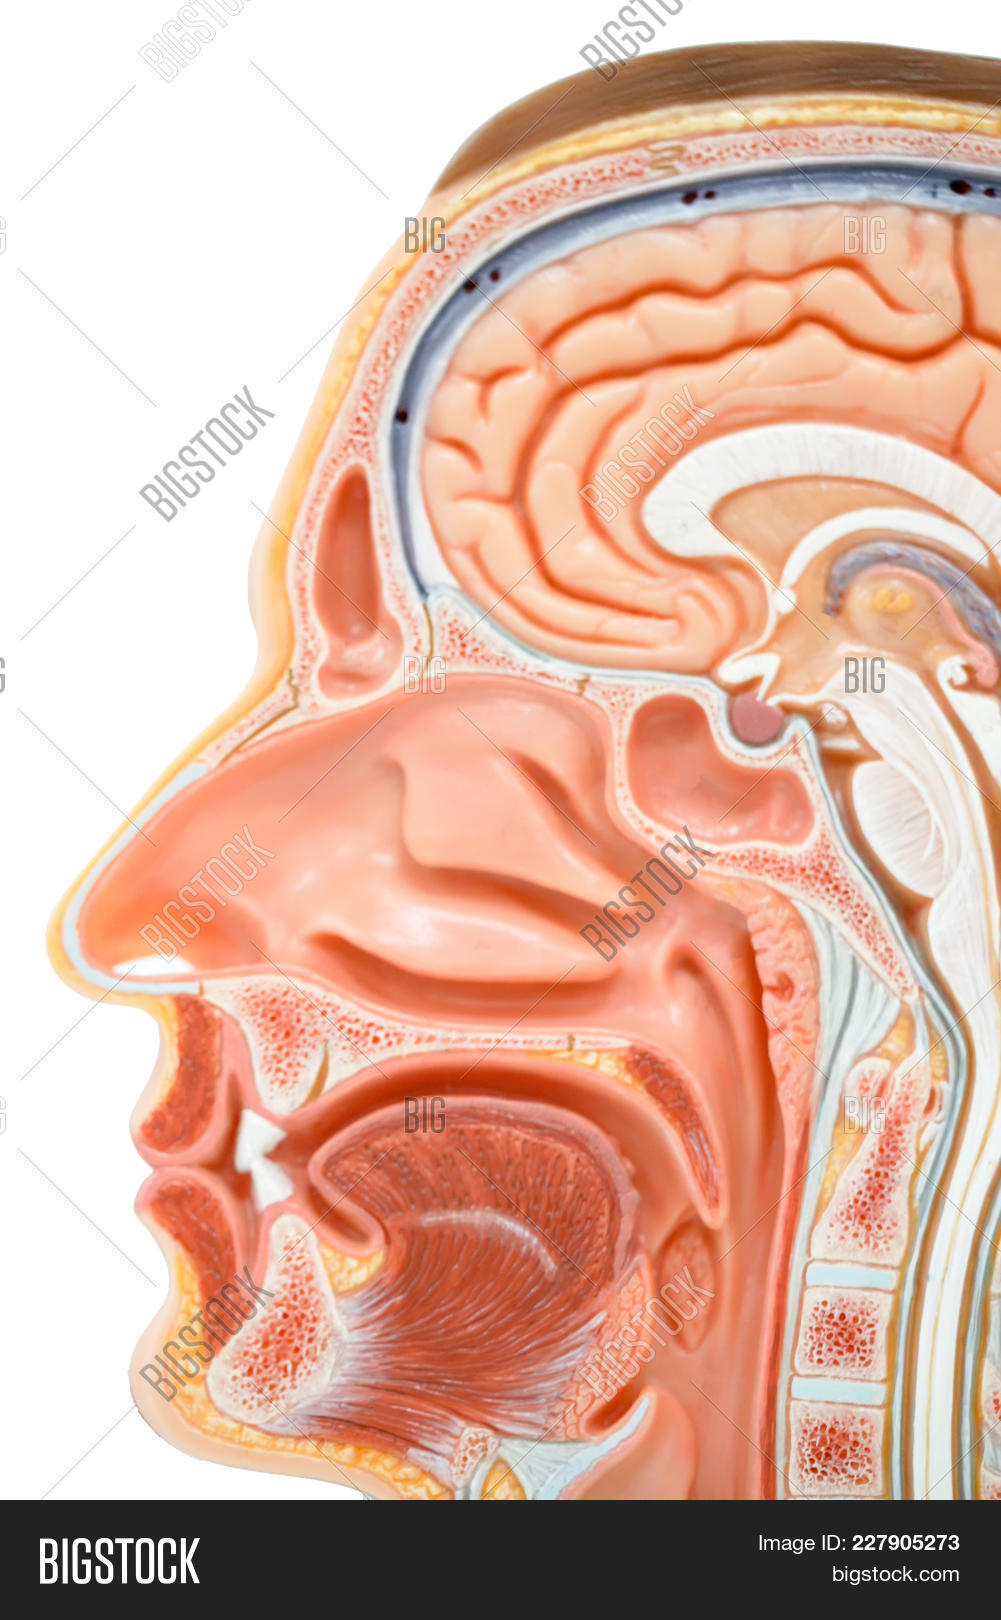 Human Head Anatomy Image & Photo (Free Trial)   Bigstock